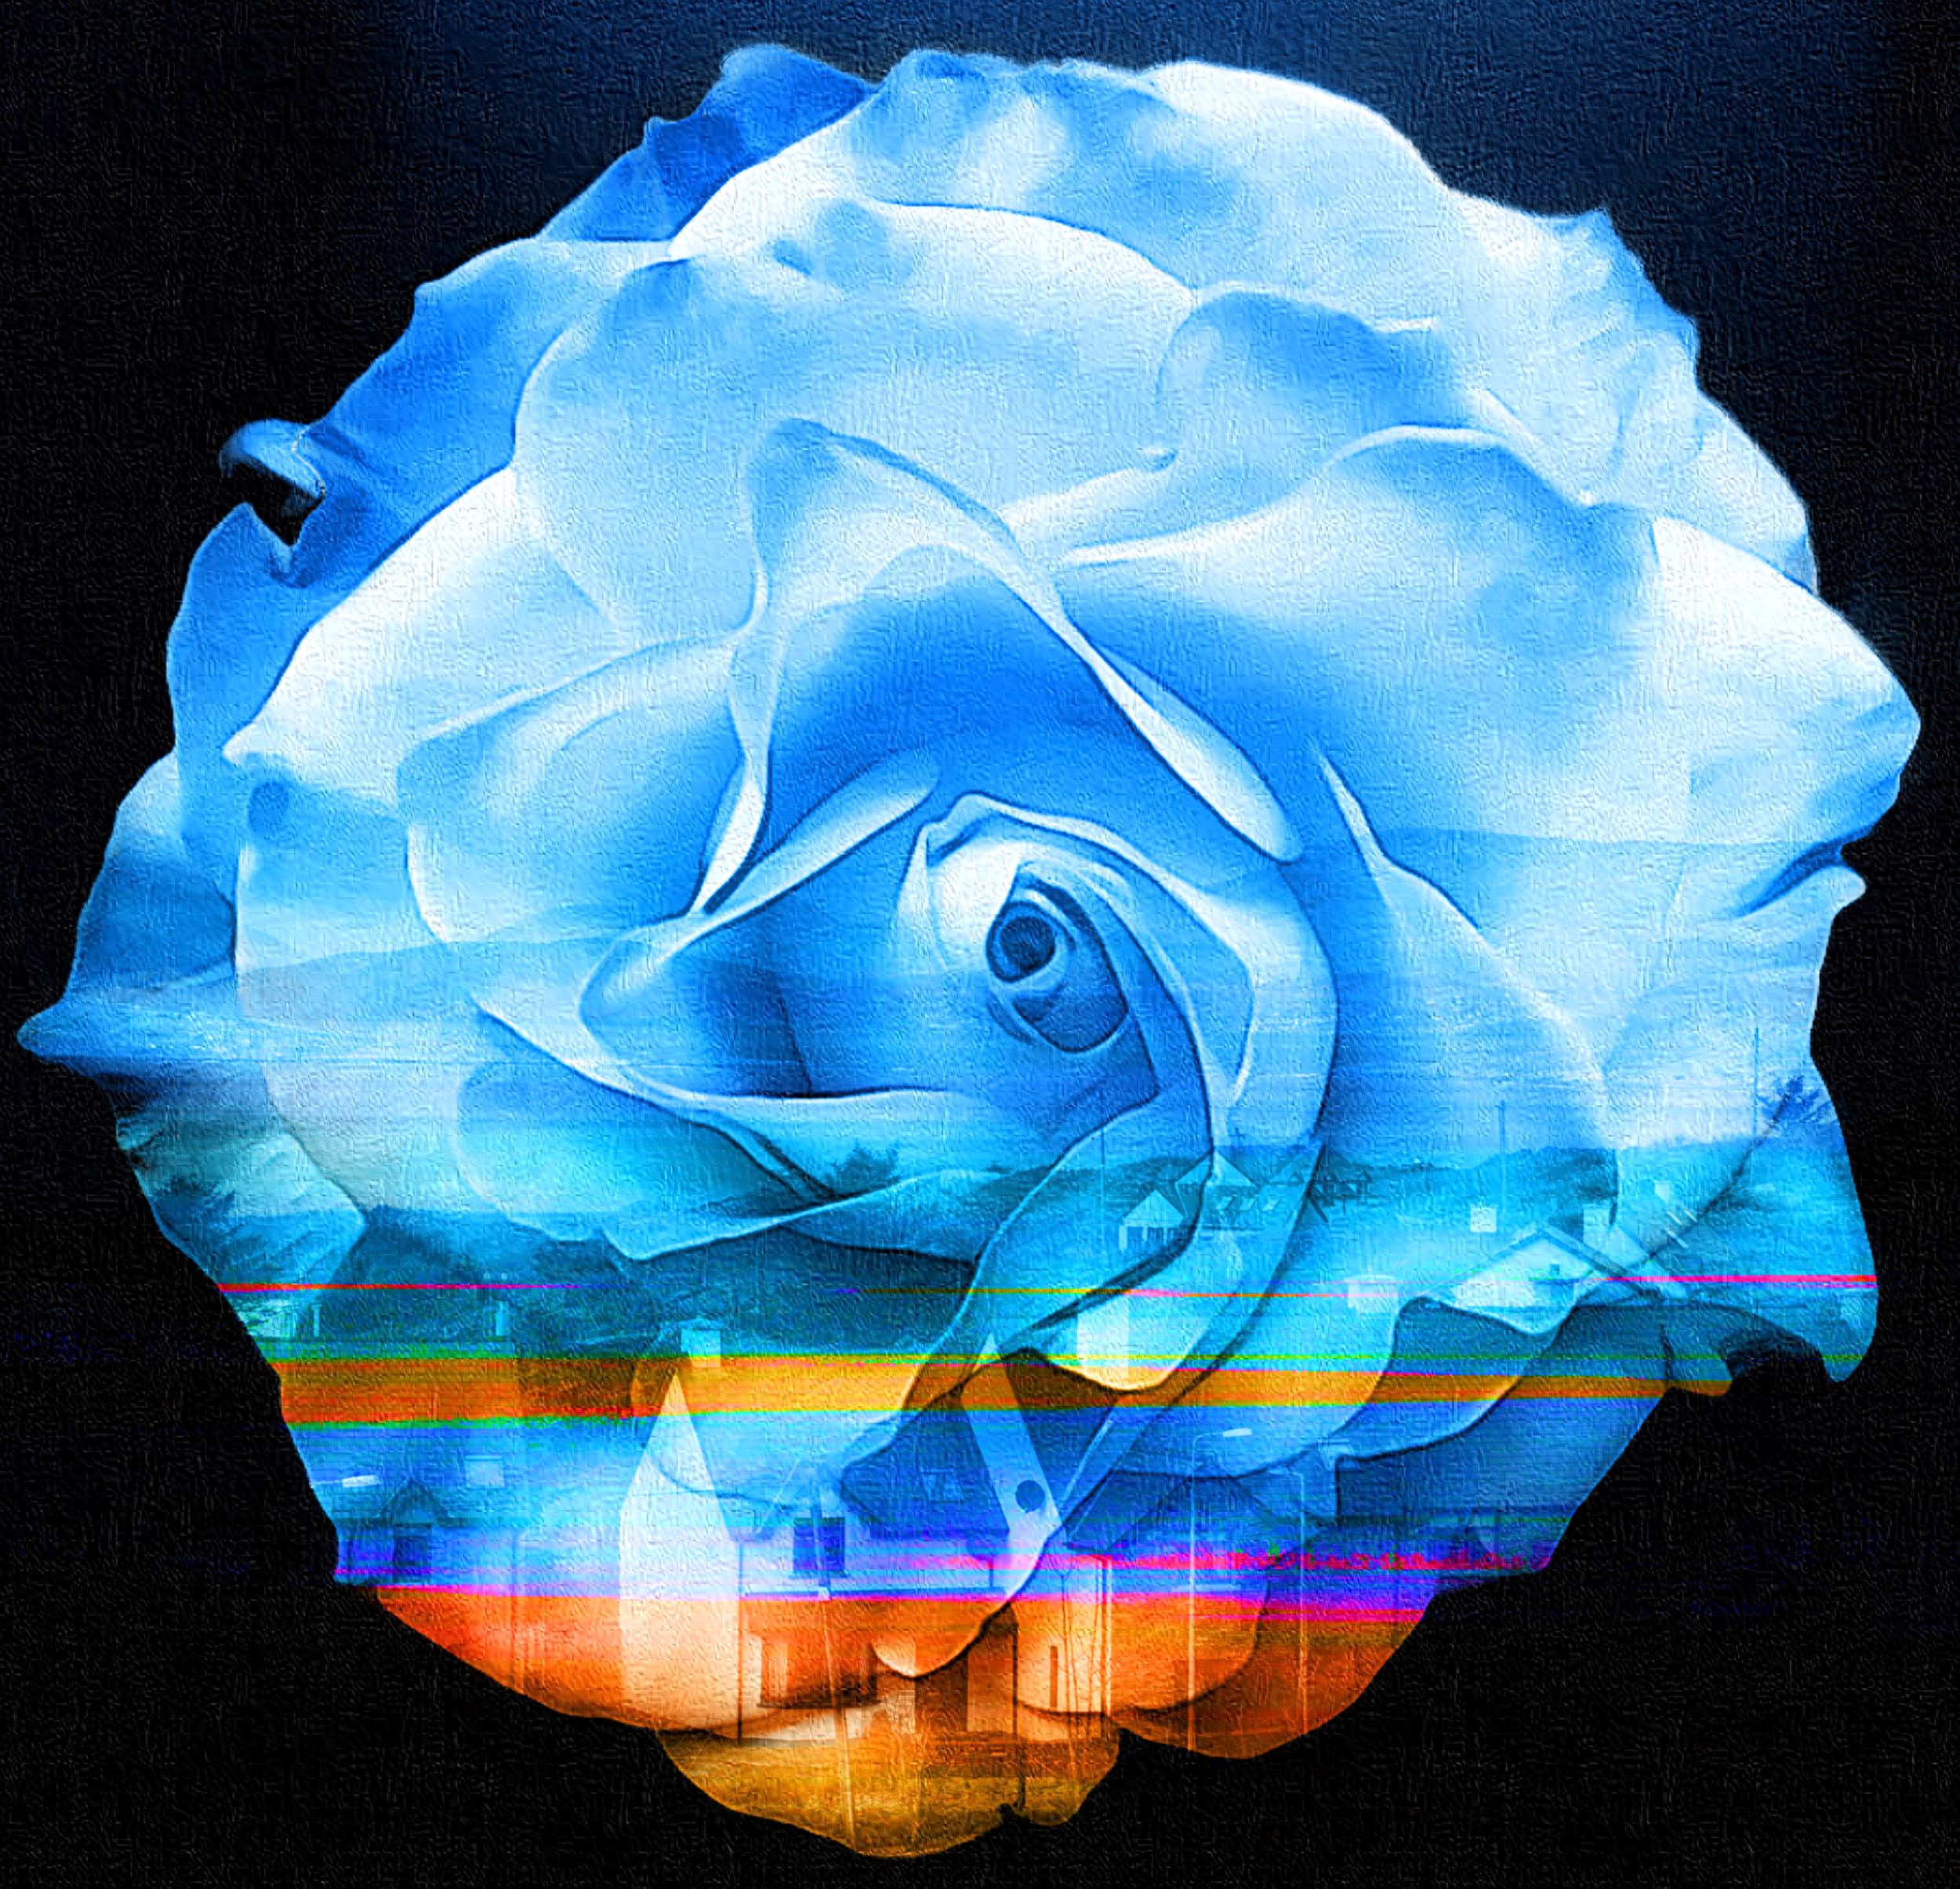 April 30, 2019 - Rose of Shannon, Ireland [Magic Eraser, iColorama, and FotoDa]